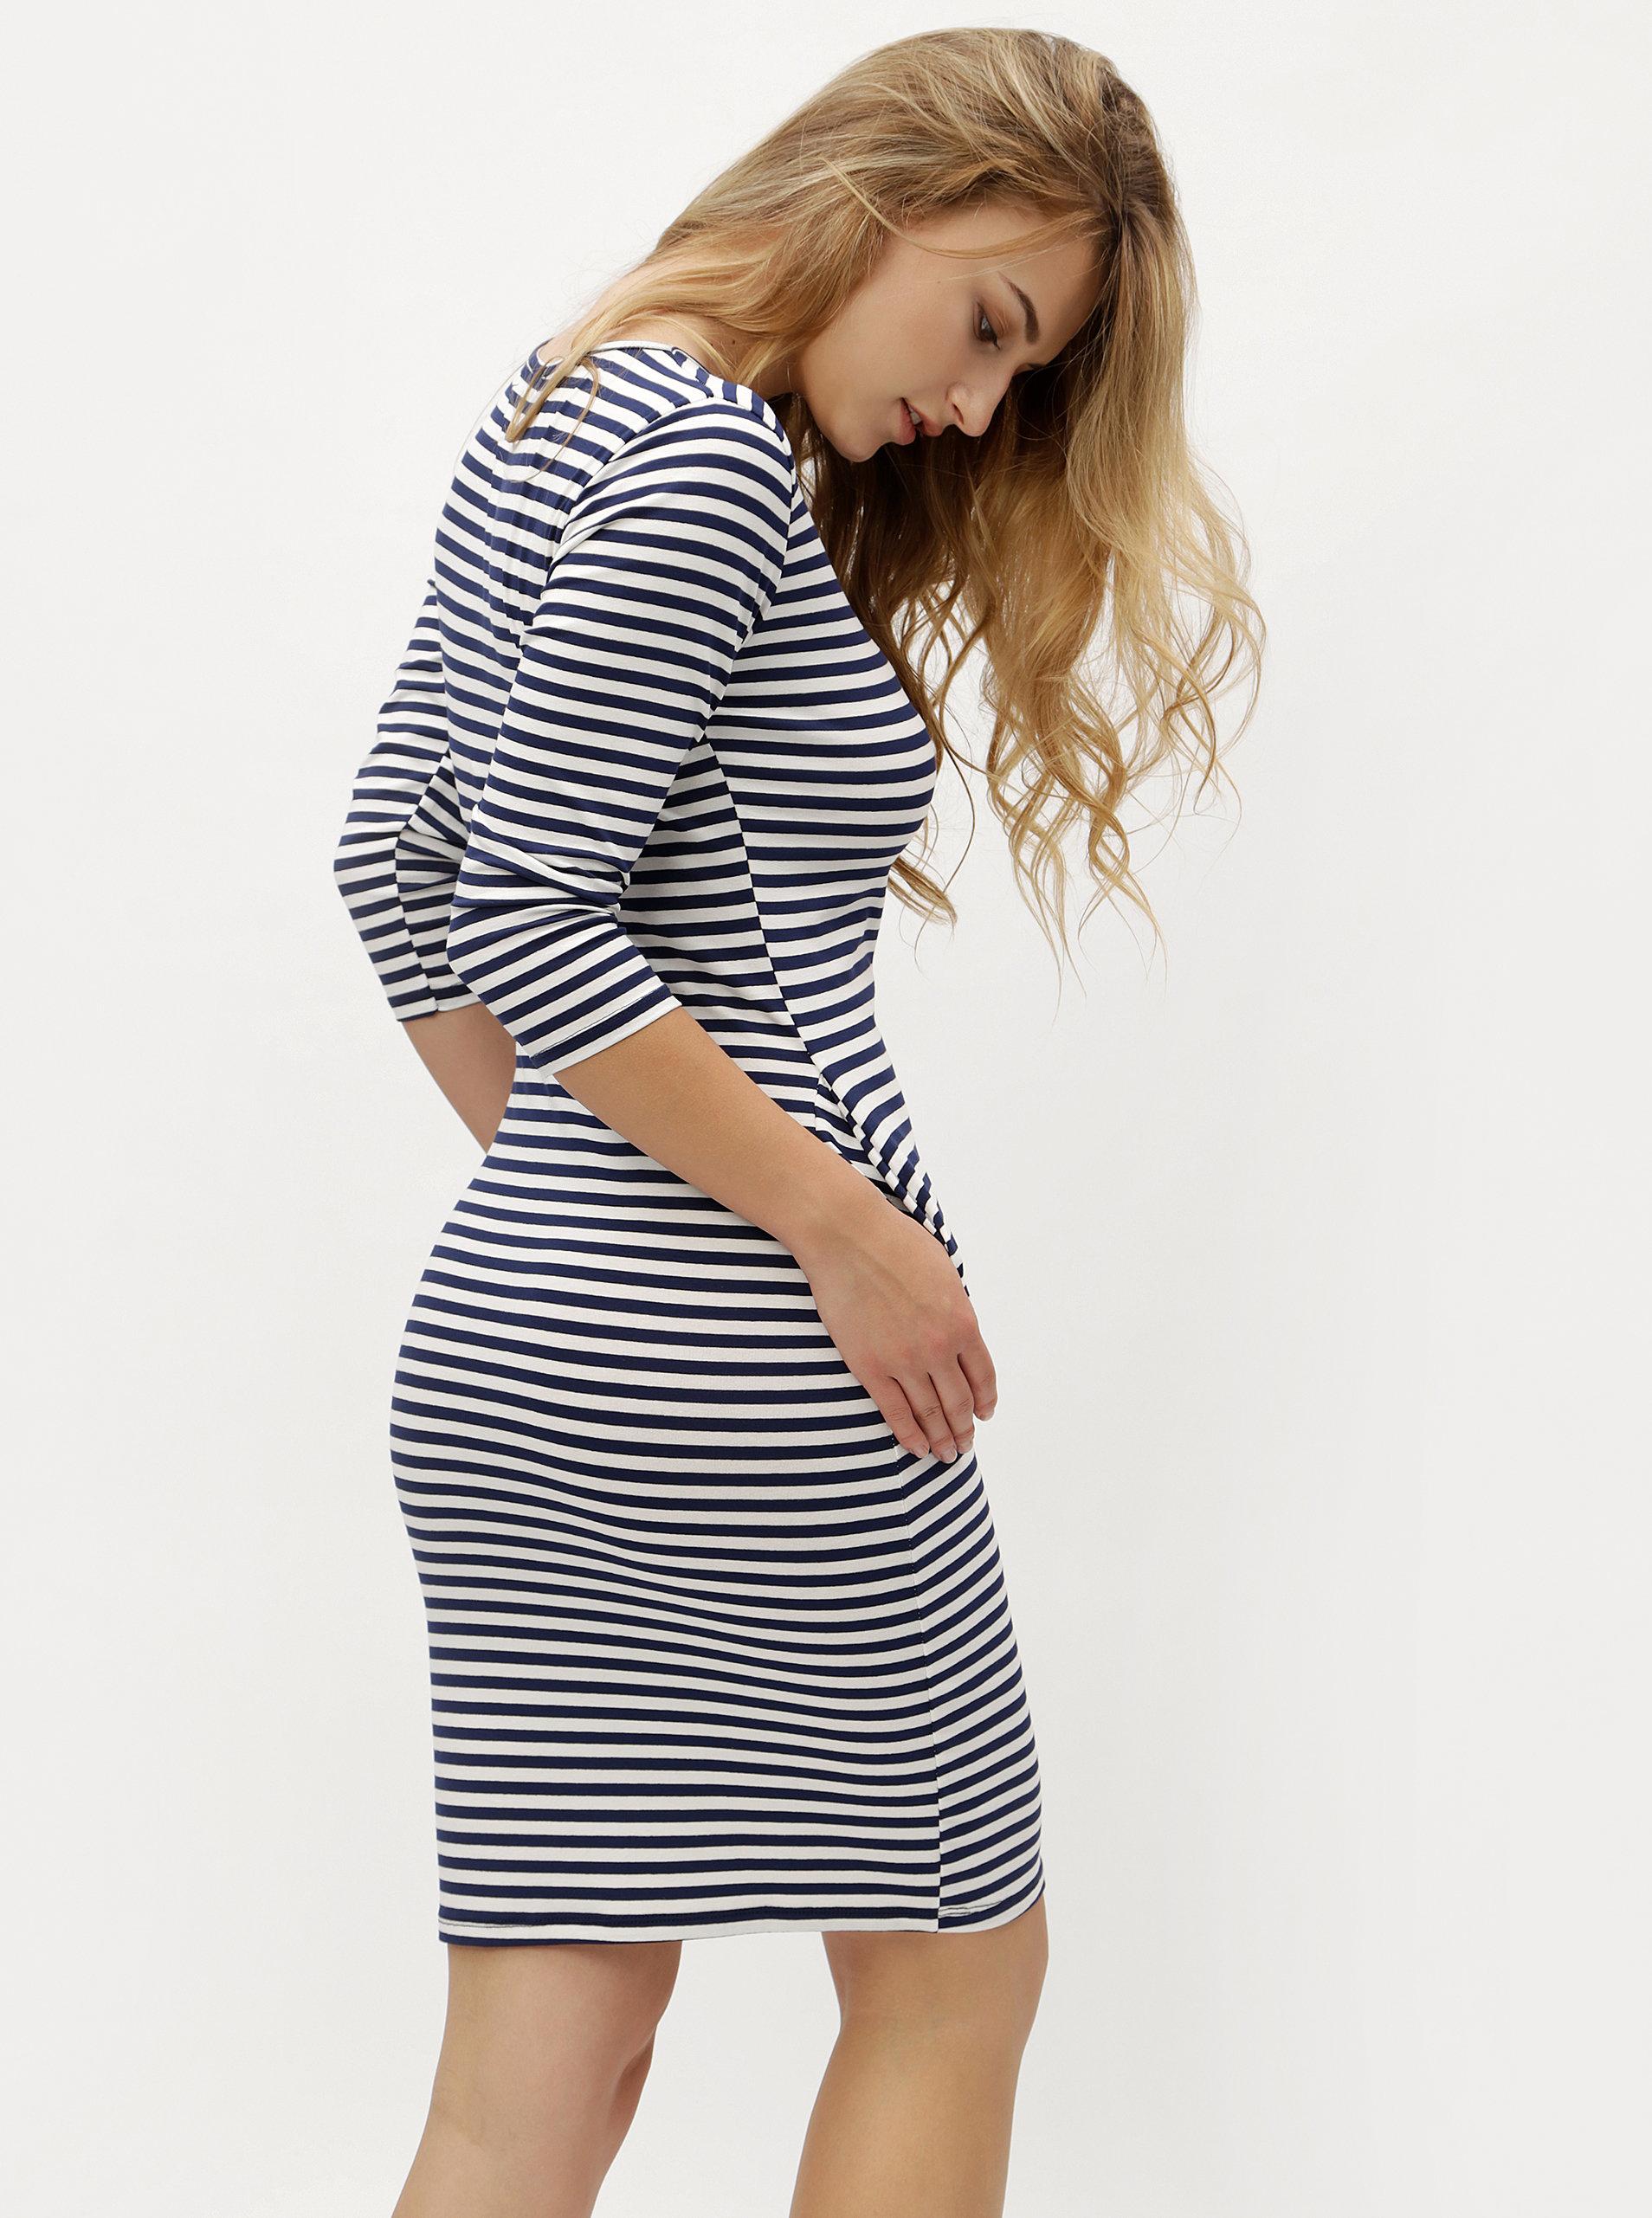 Modro-biele pruhované šaty s vreckami ZOOT ... a63efc102c5